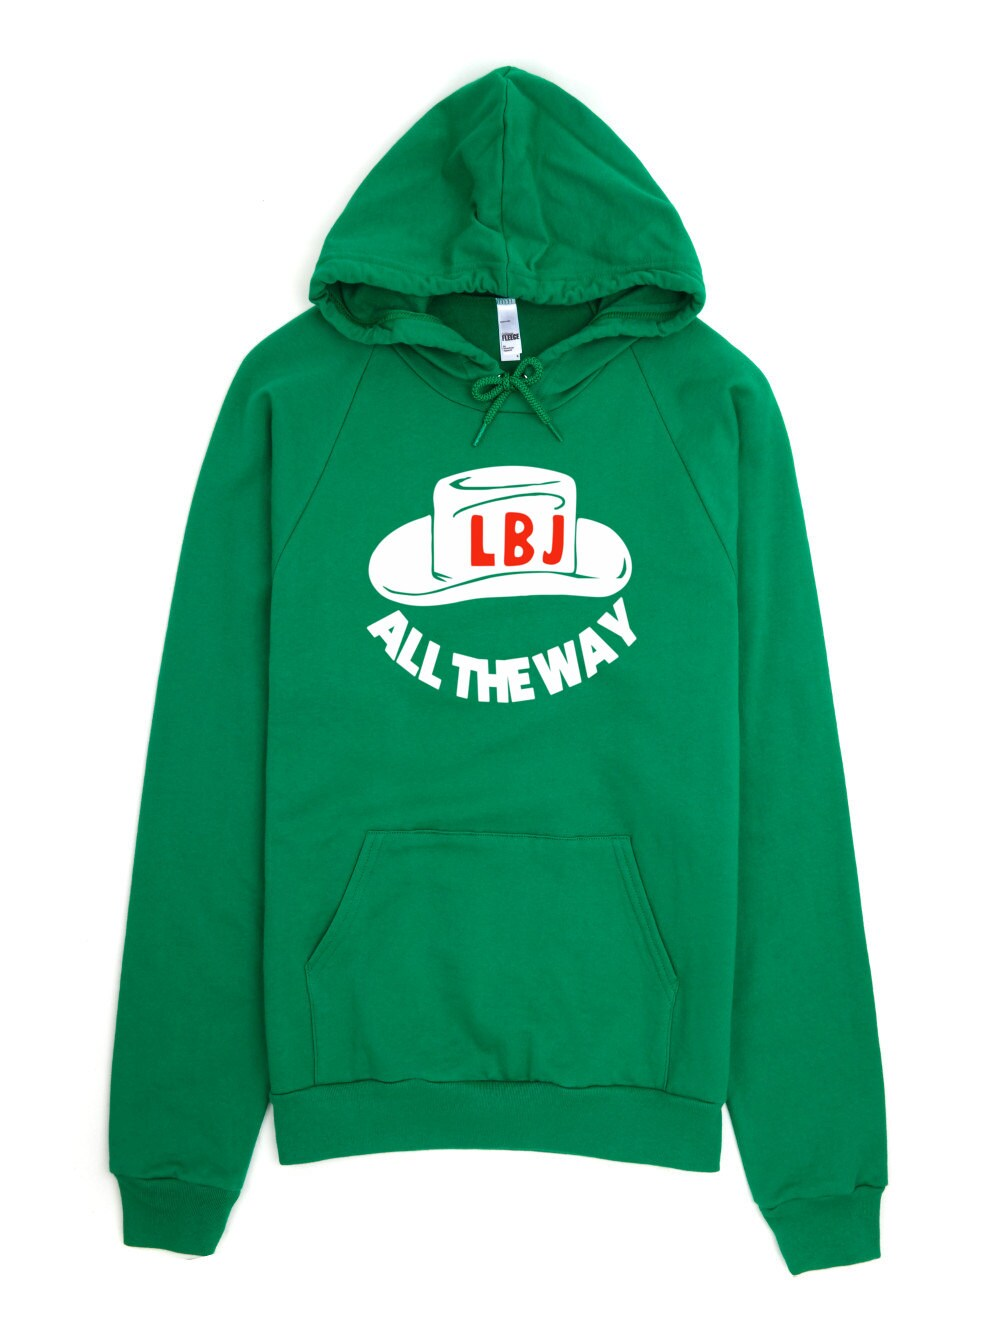 LBJ Sweatshirt -  - All The Way With LBJ Political Campaign For Lyndon B Johnson LBJ Hoodie